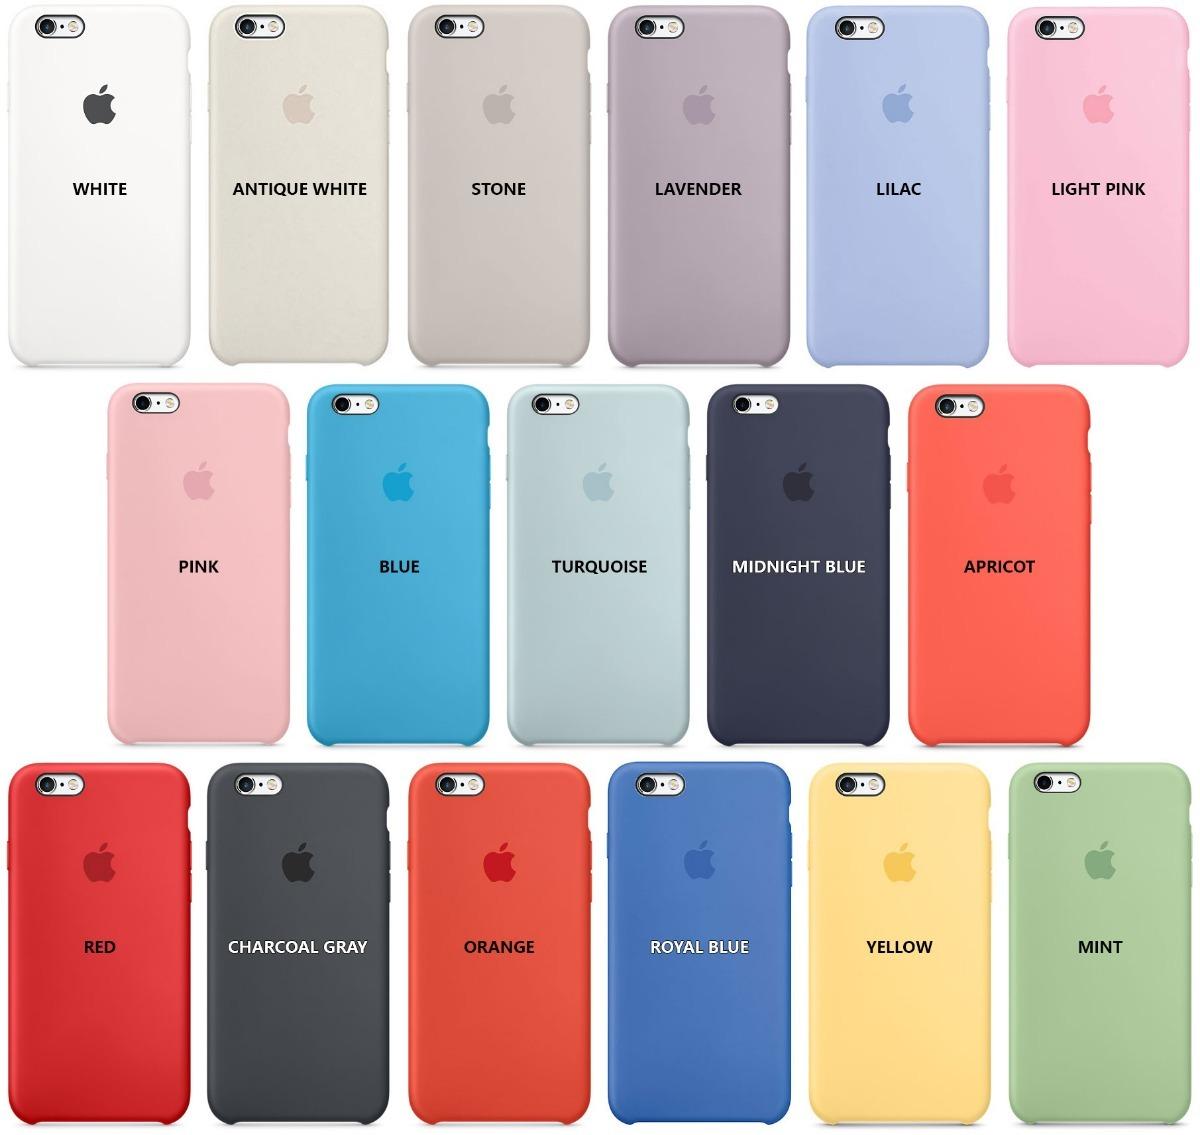 44961125dde funda iphone 6 6s plus apple original silicona villa devoto. Cargando zoom.